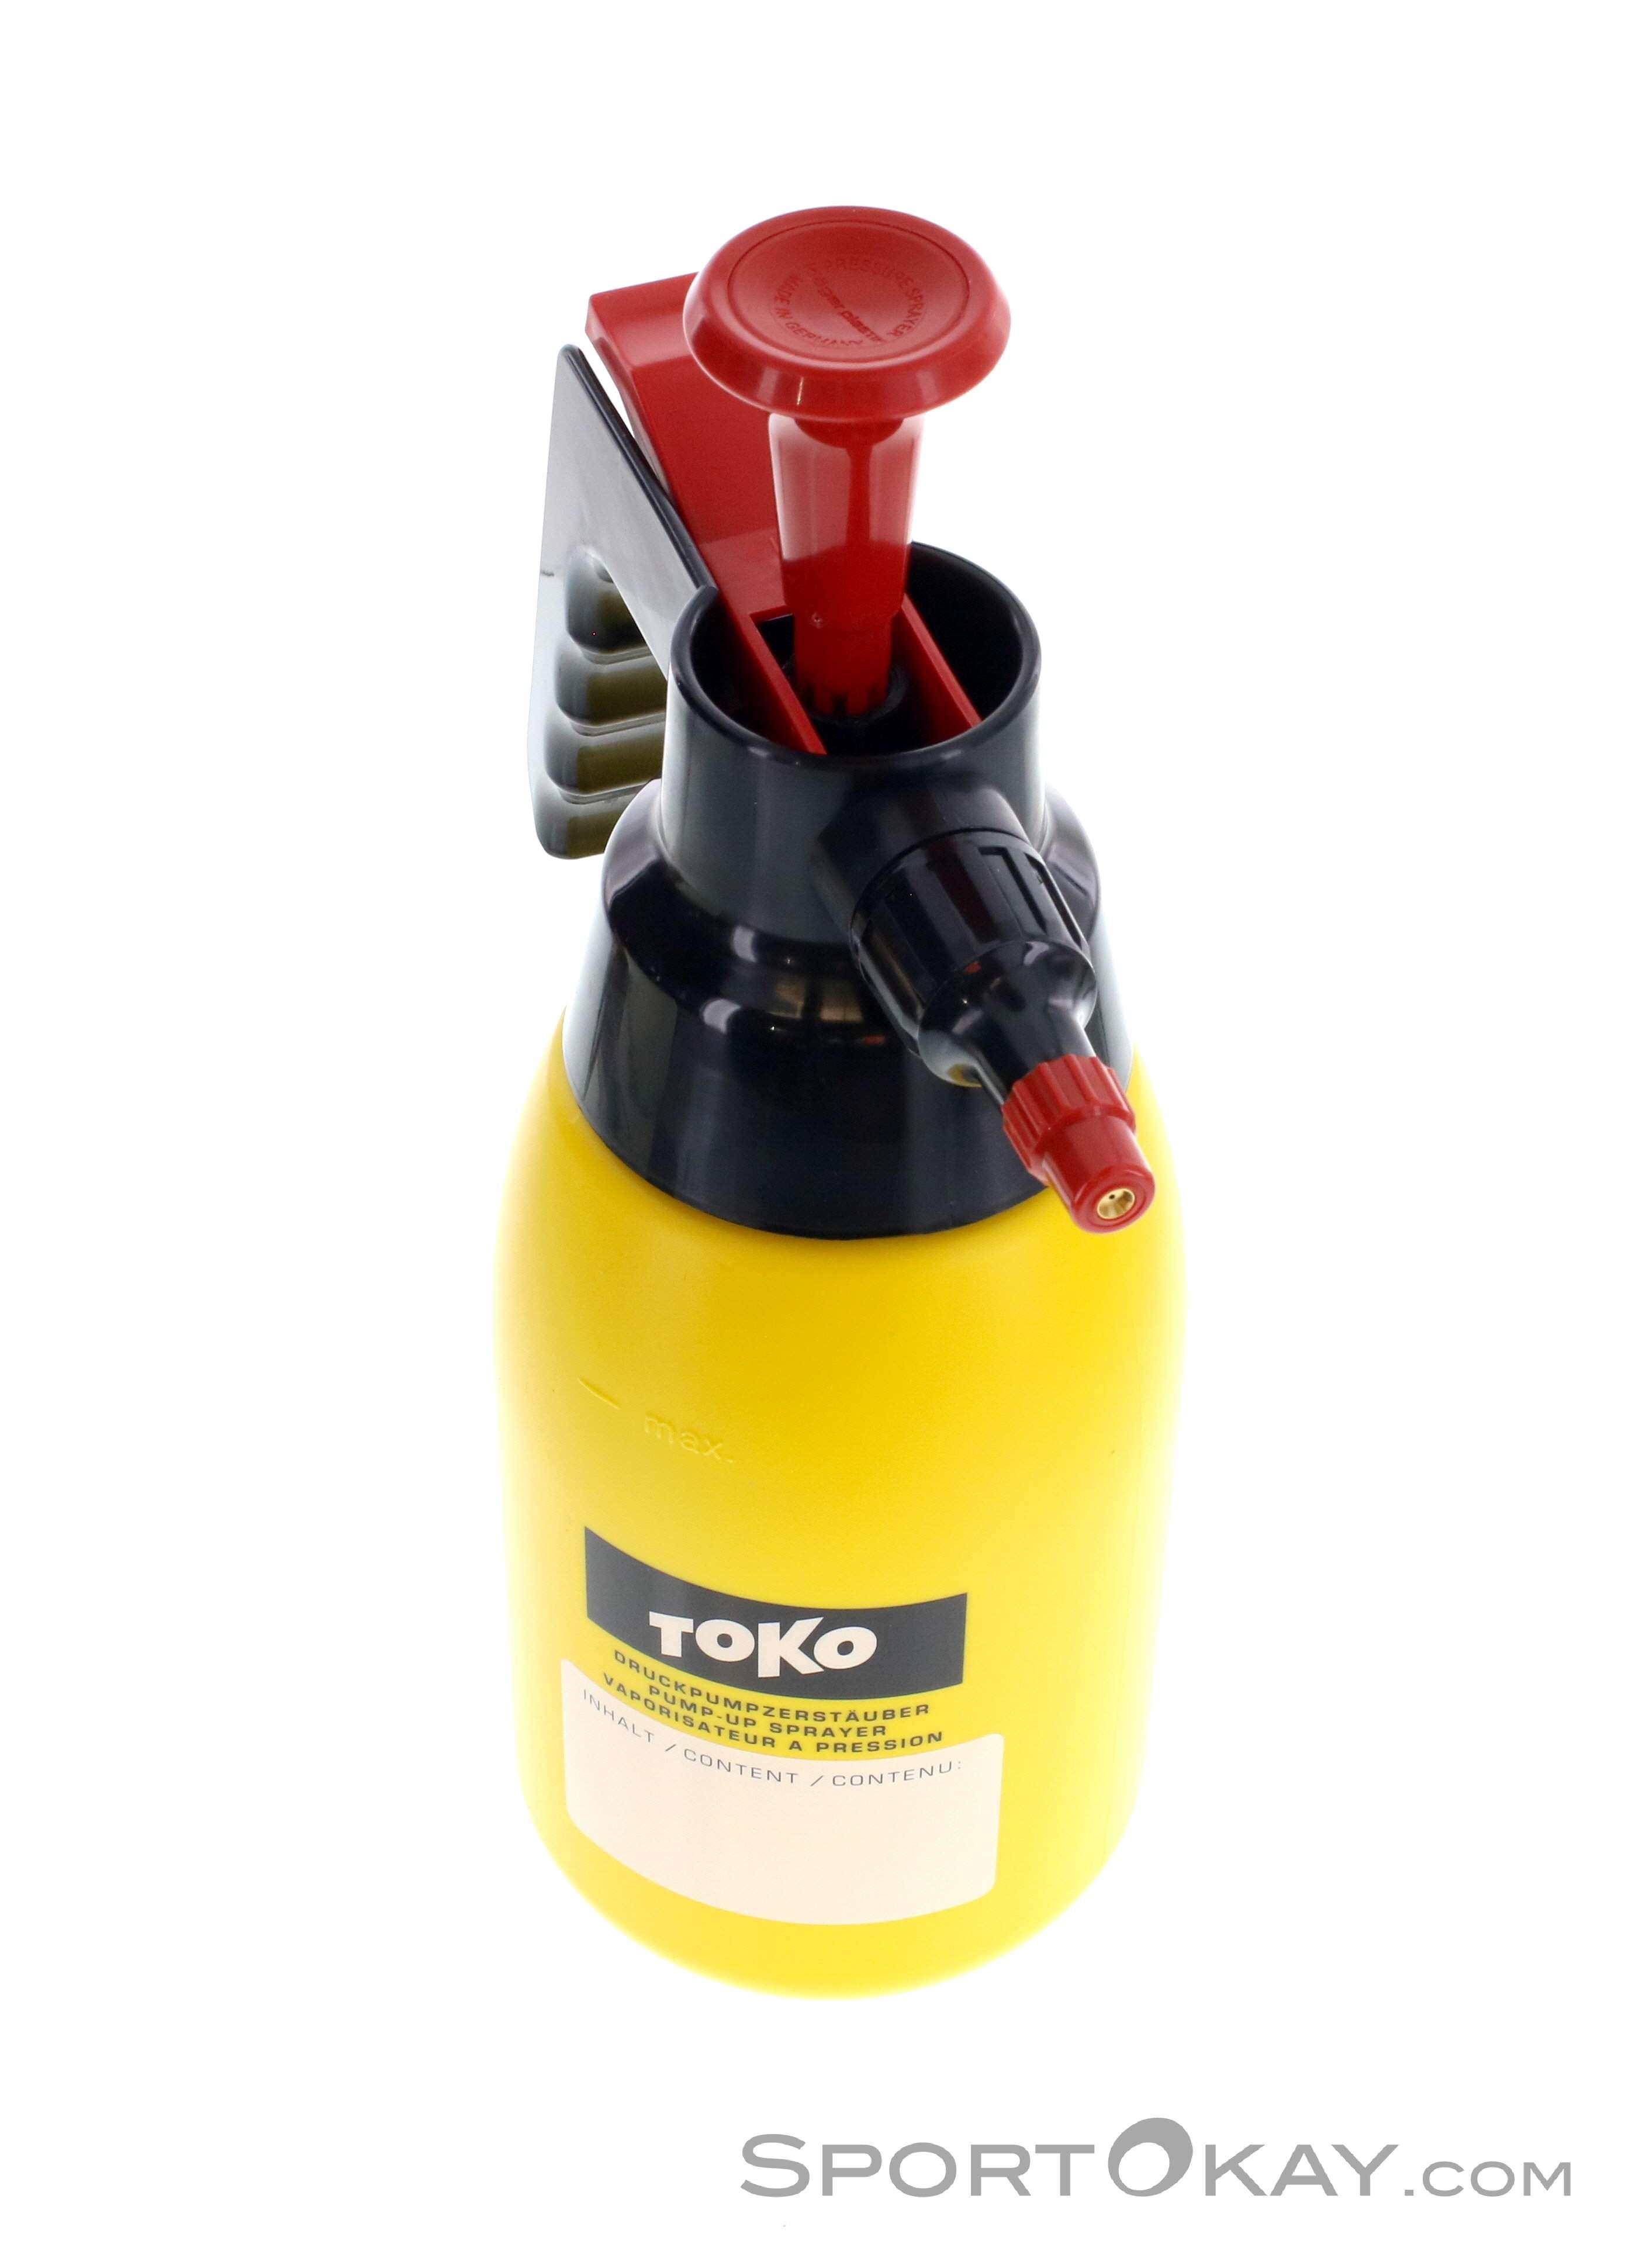 Toko Toko Pump-Up Sprayer 900ml Spray Bottle